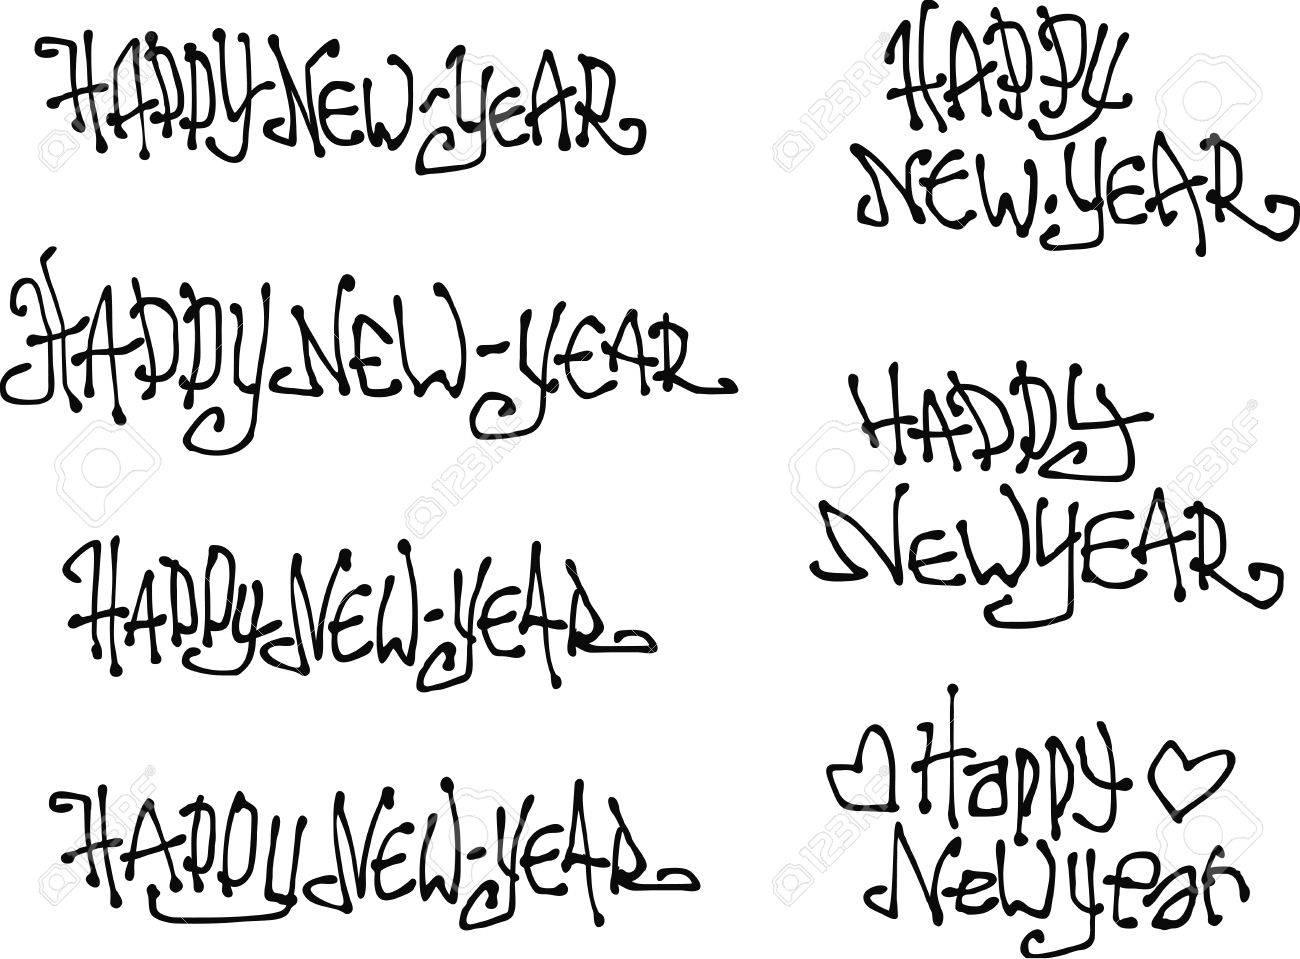 Happy New Year Wish Hand Drawn Liquid Curly Graffiti Fonts Royalty ...